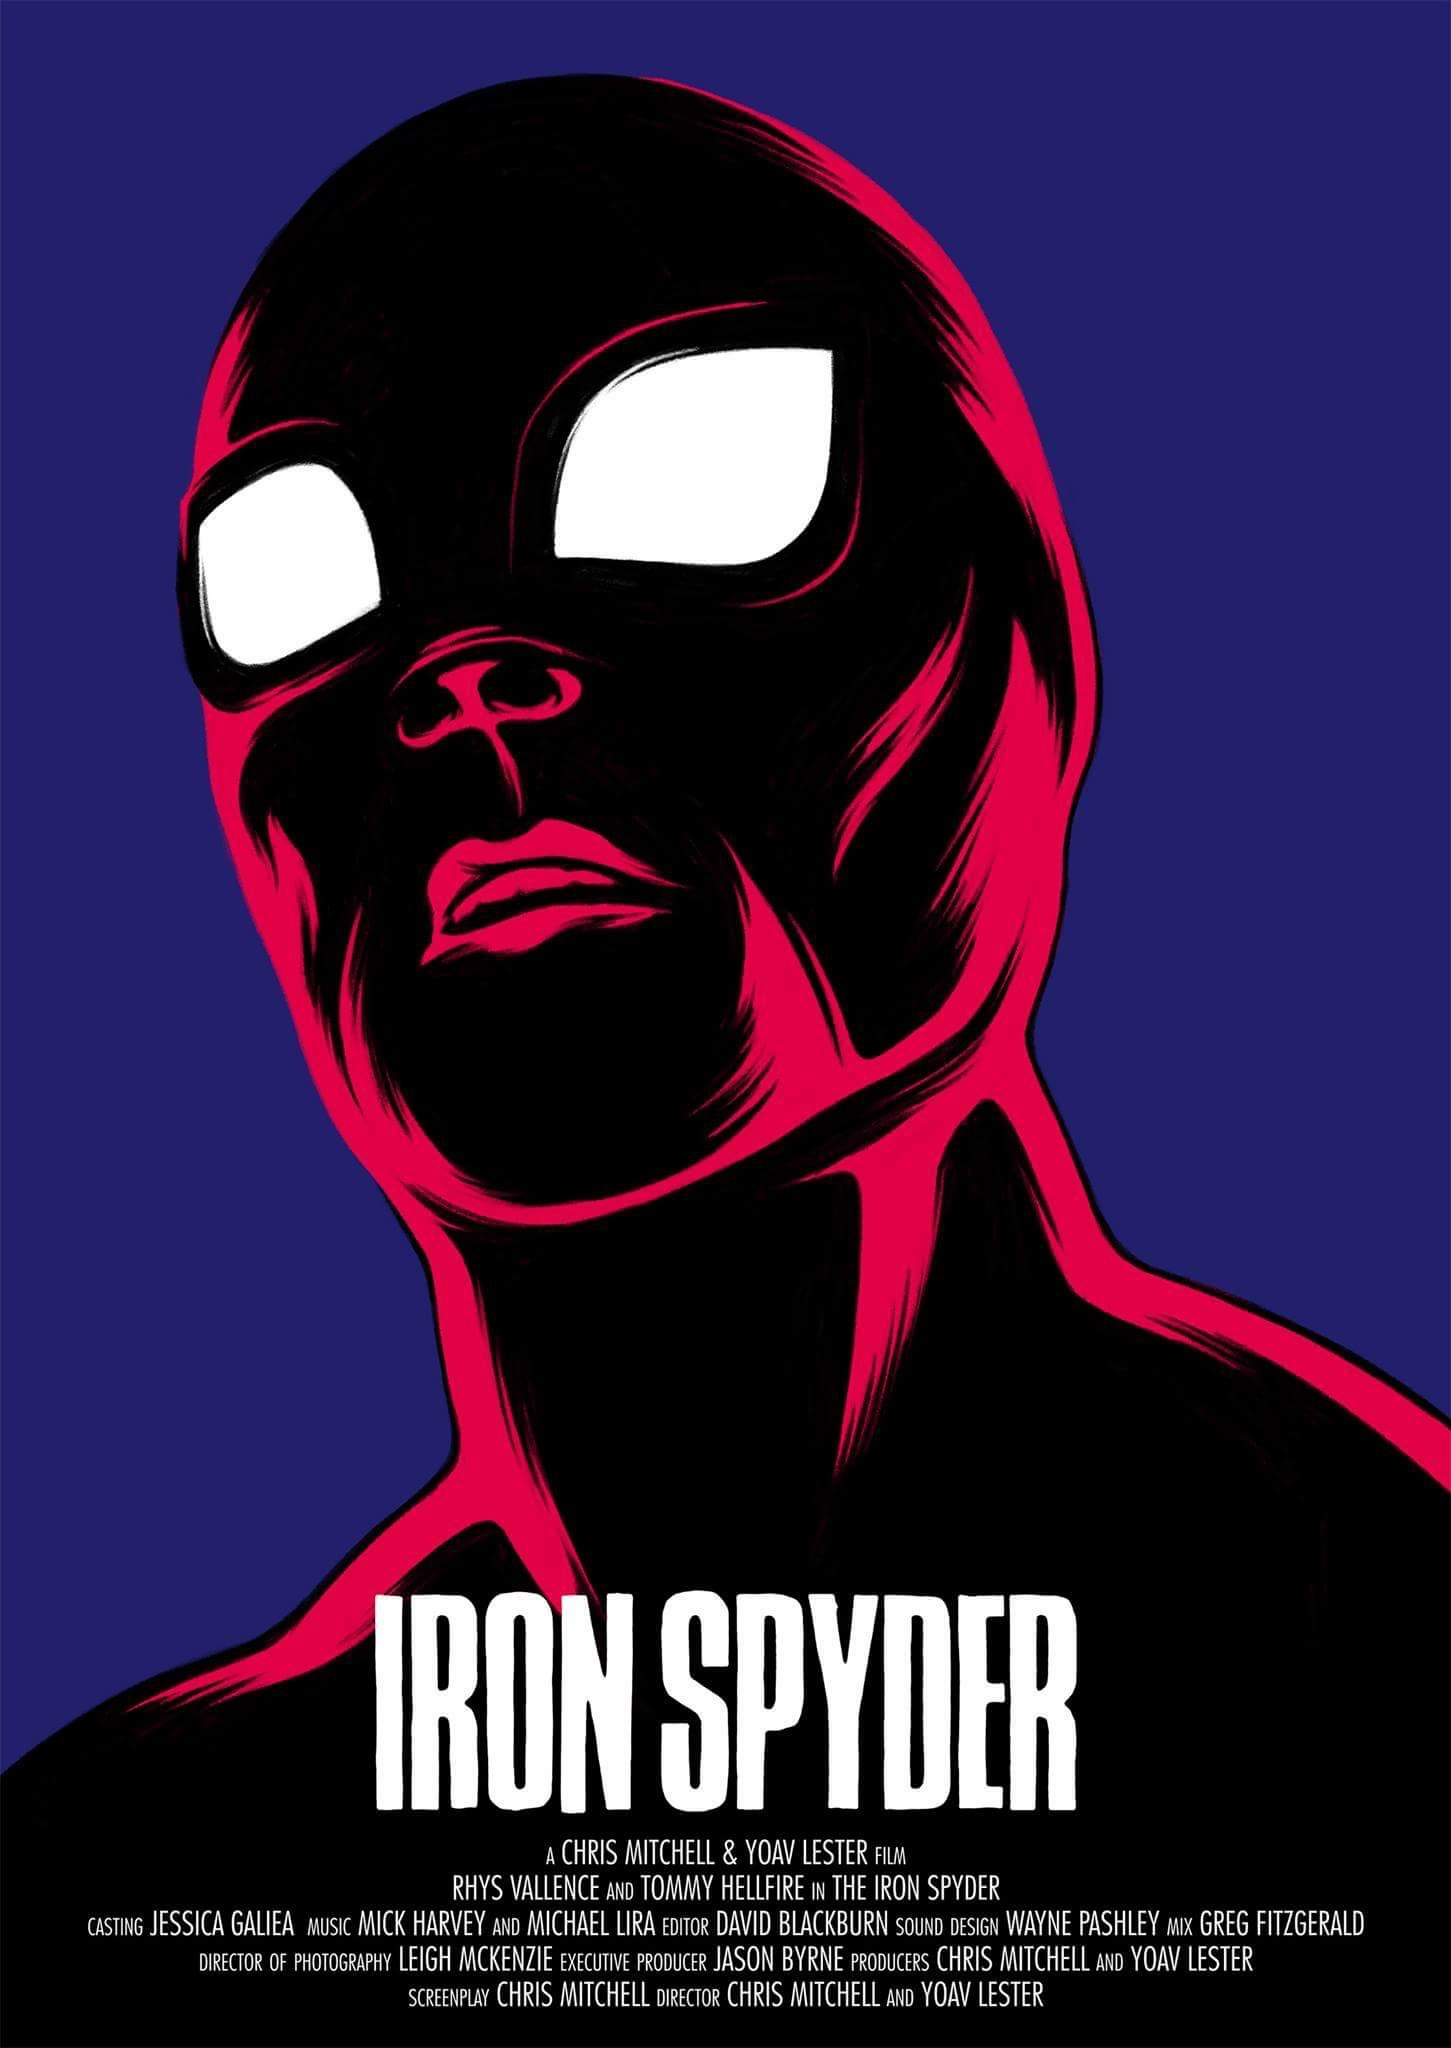 Iron Spyder